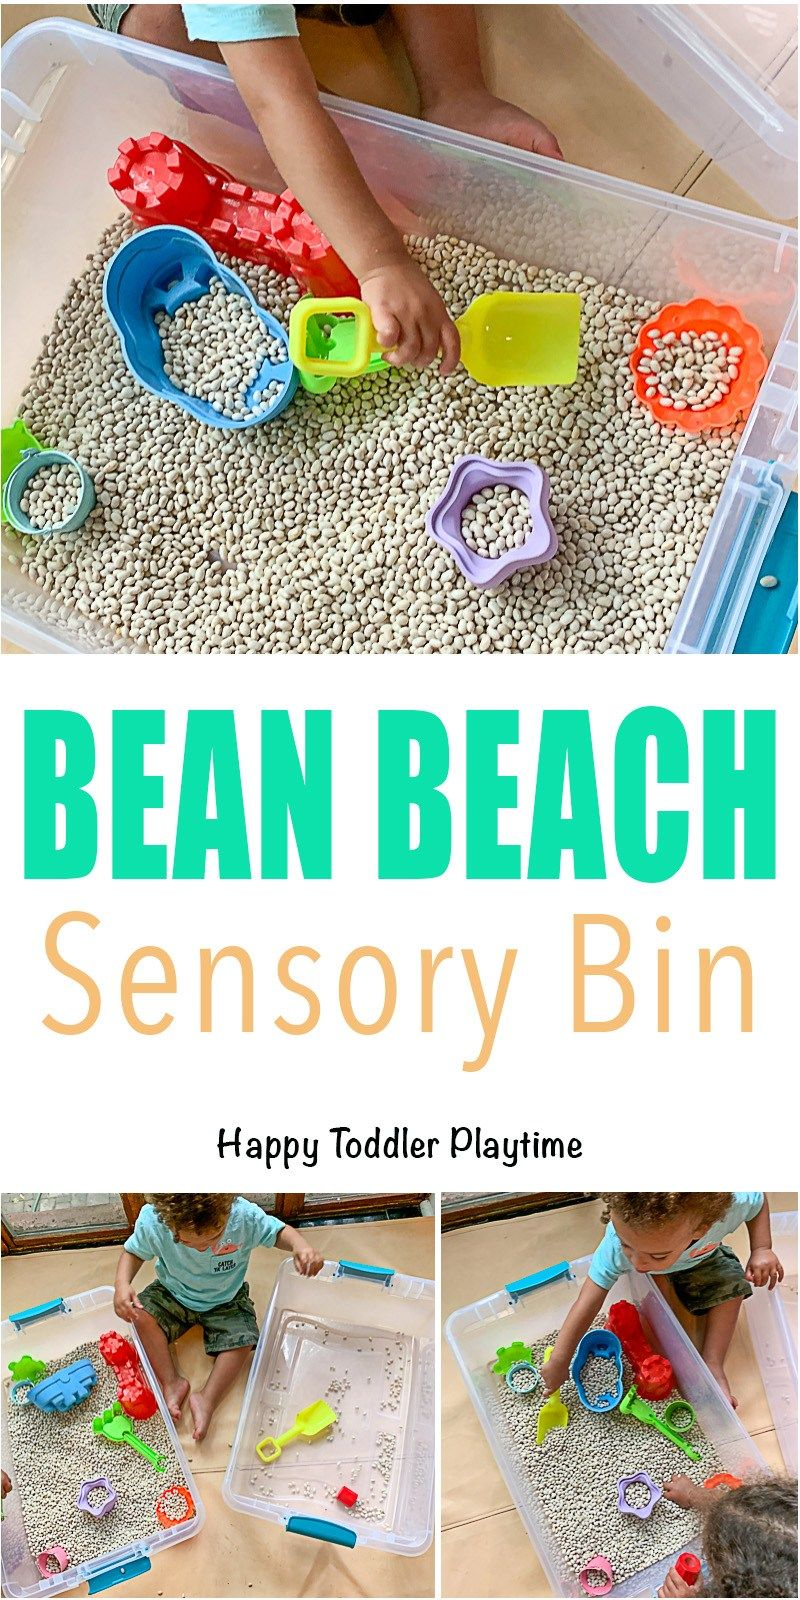 Bean Beach Sensory Bin - HAPPY TODDLER PLAYTIME